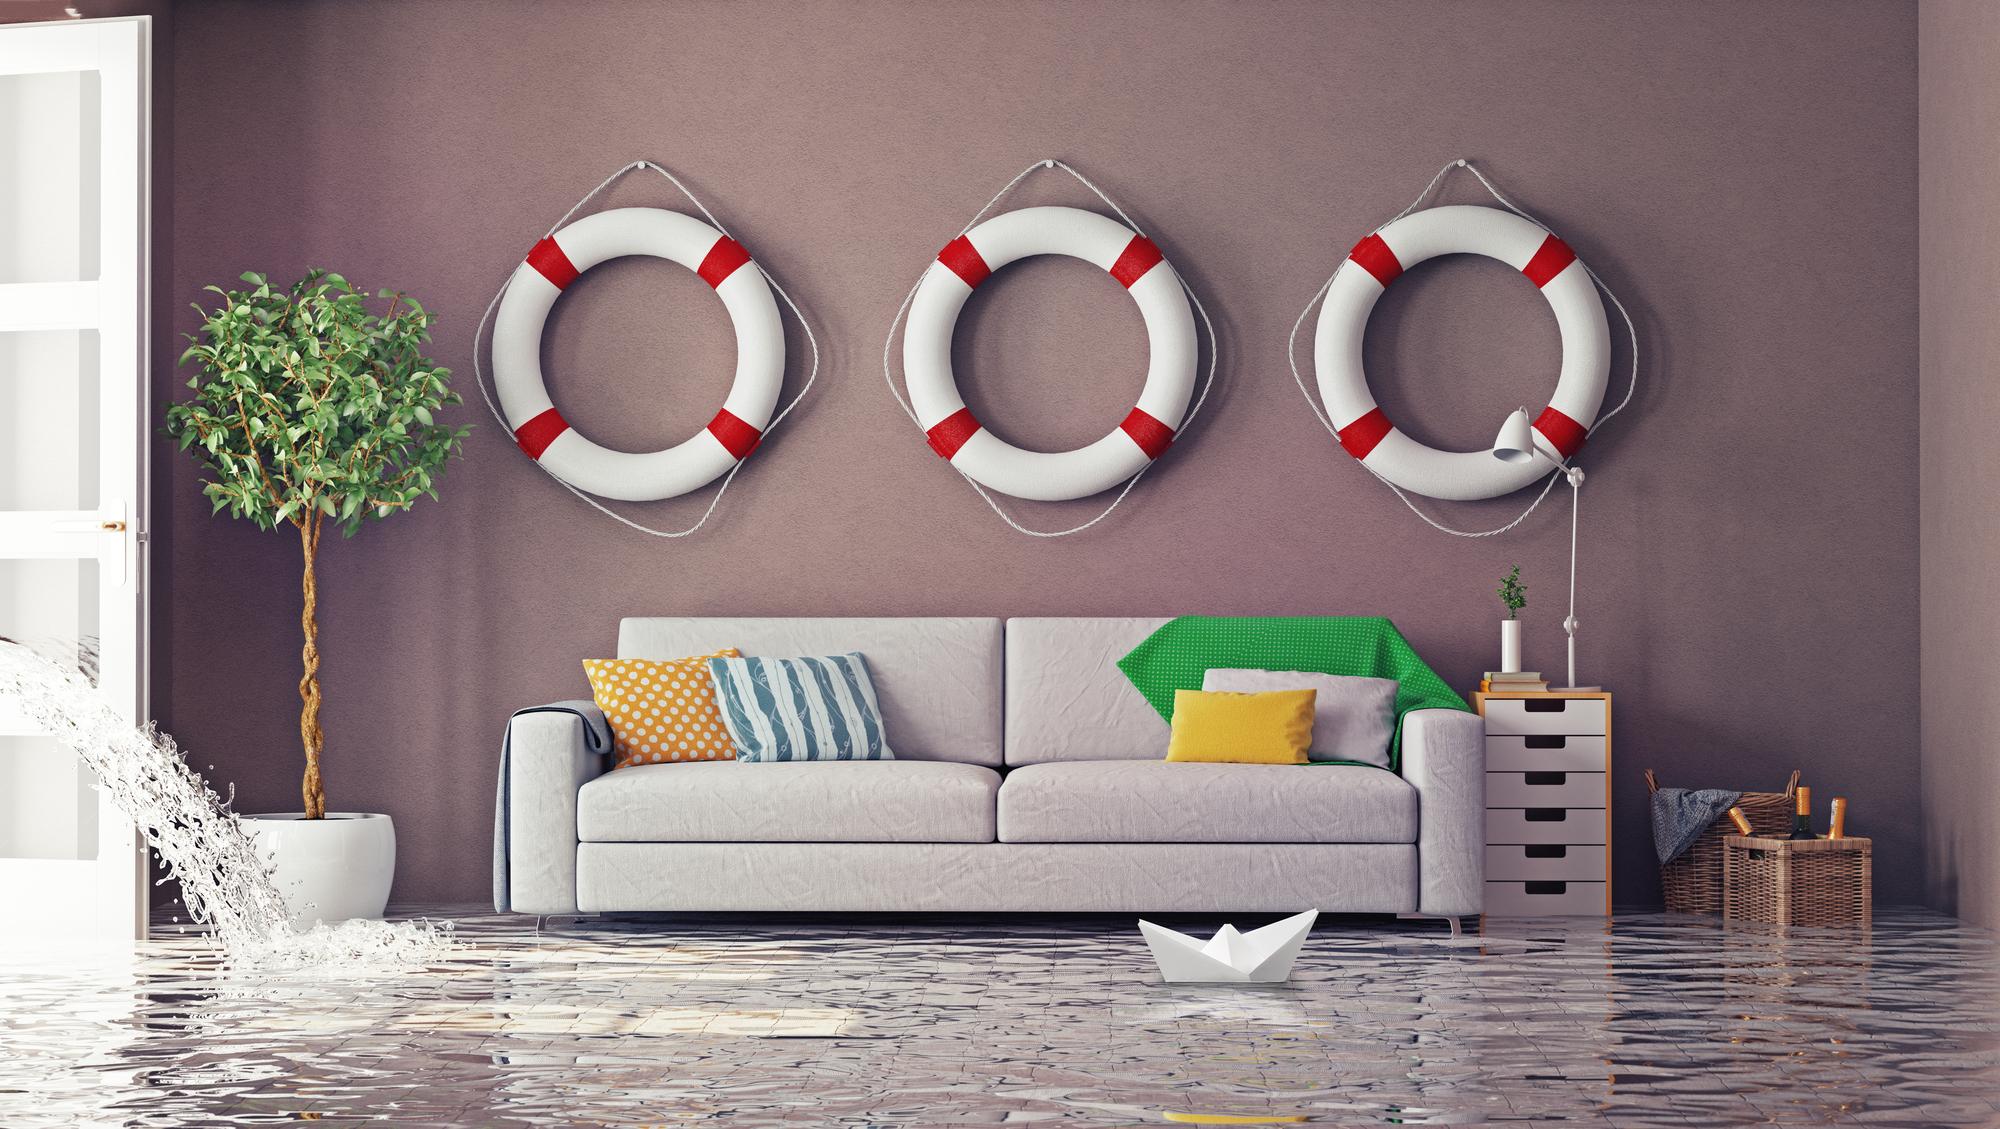 OIG Florida Flood Insurance